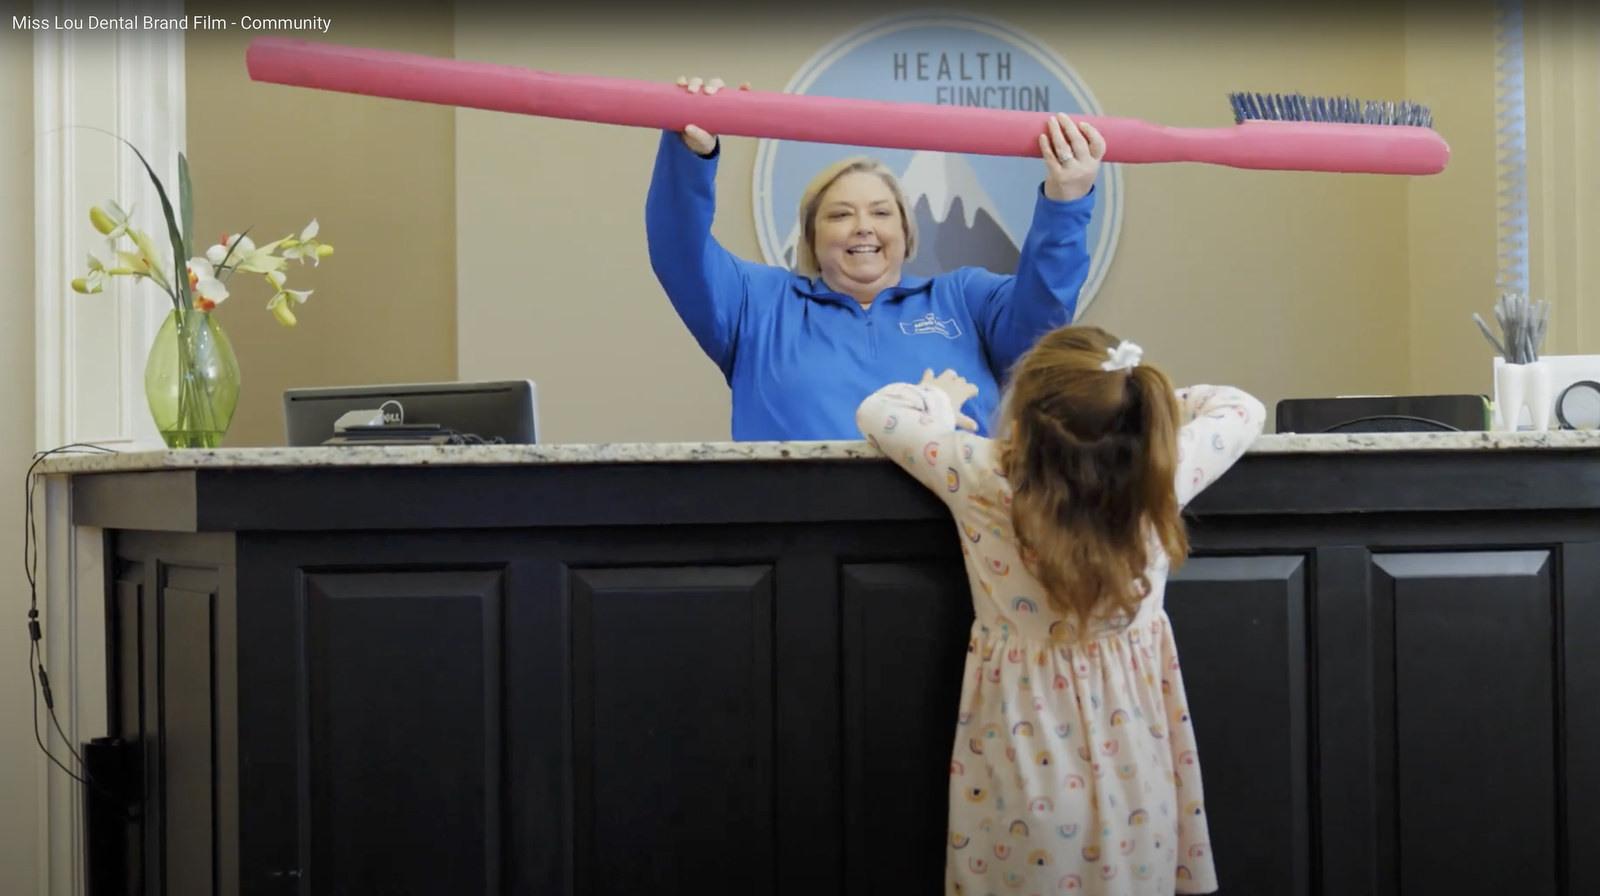 Client - Miss Lou Family Dentistry, Location - Natchez MS, Purpose - Marketing & Branding